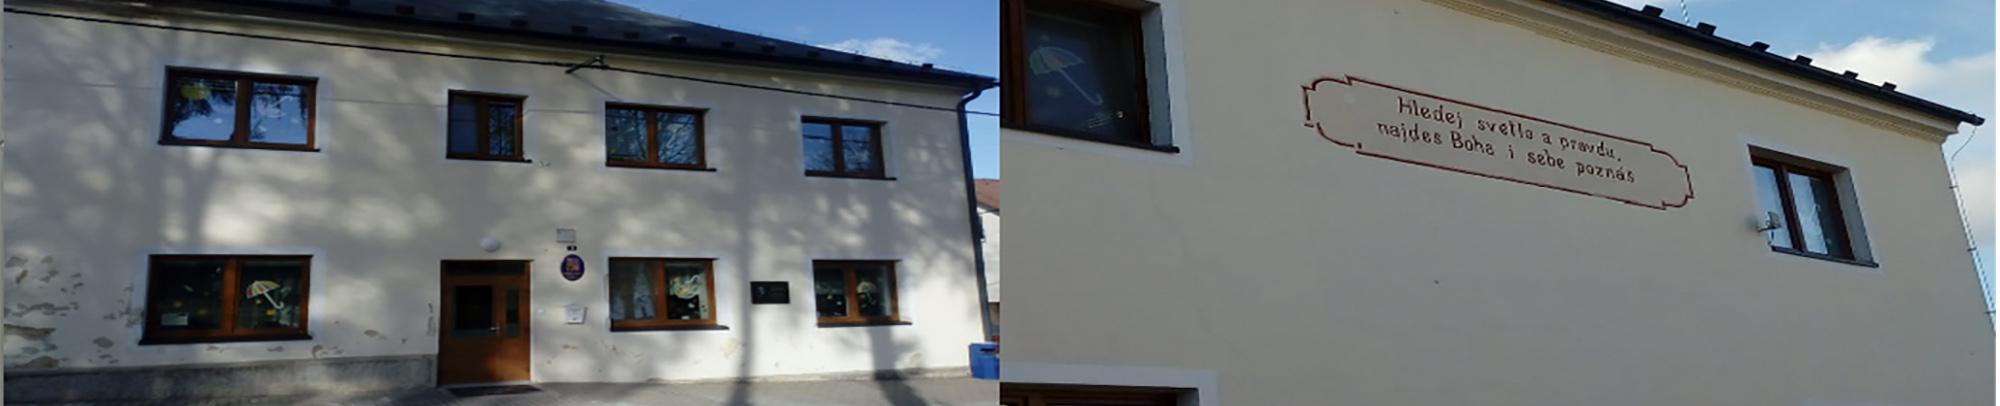 Základní škola a Mateřská škola Věcov